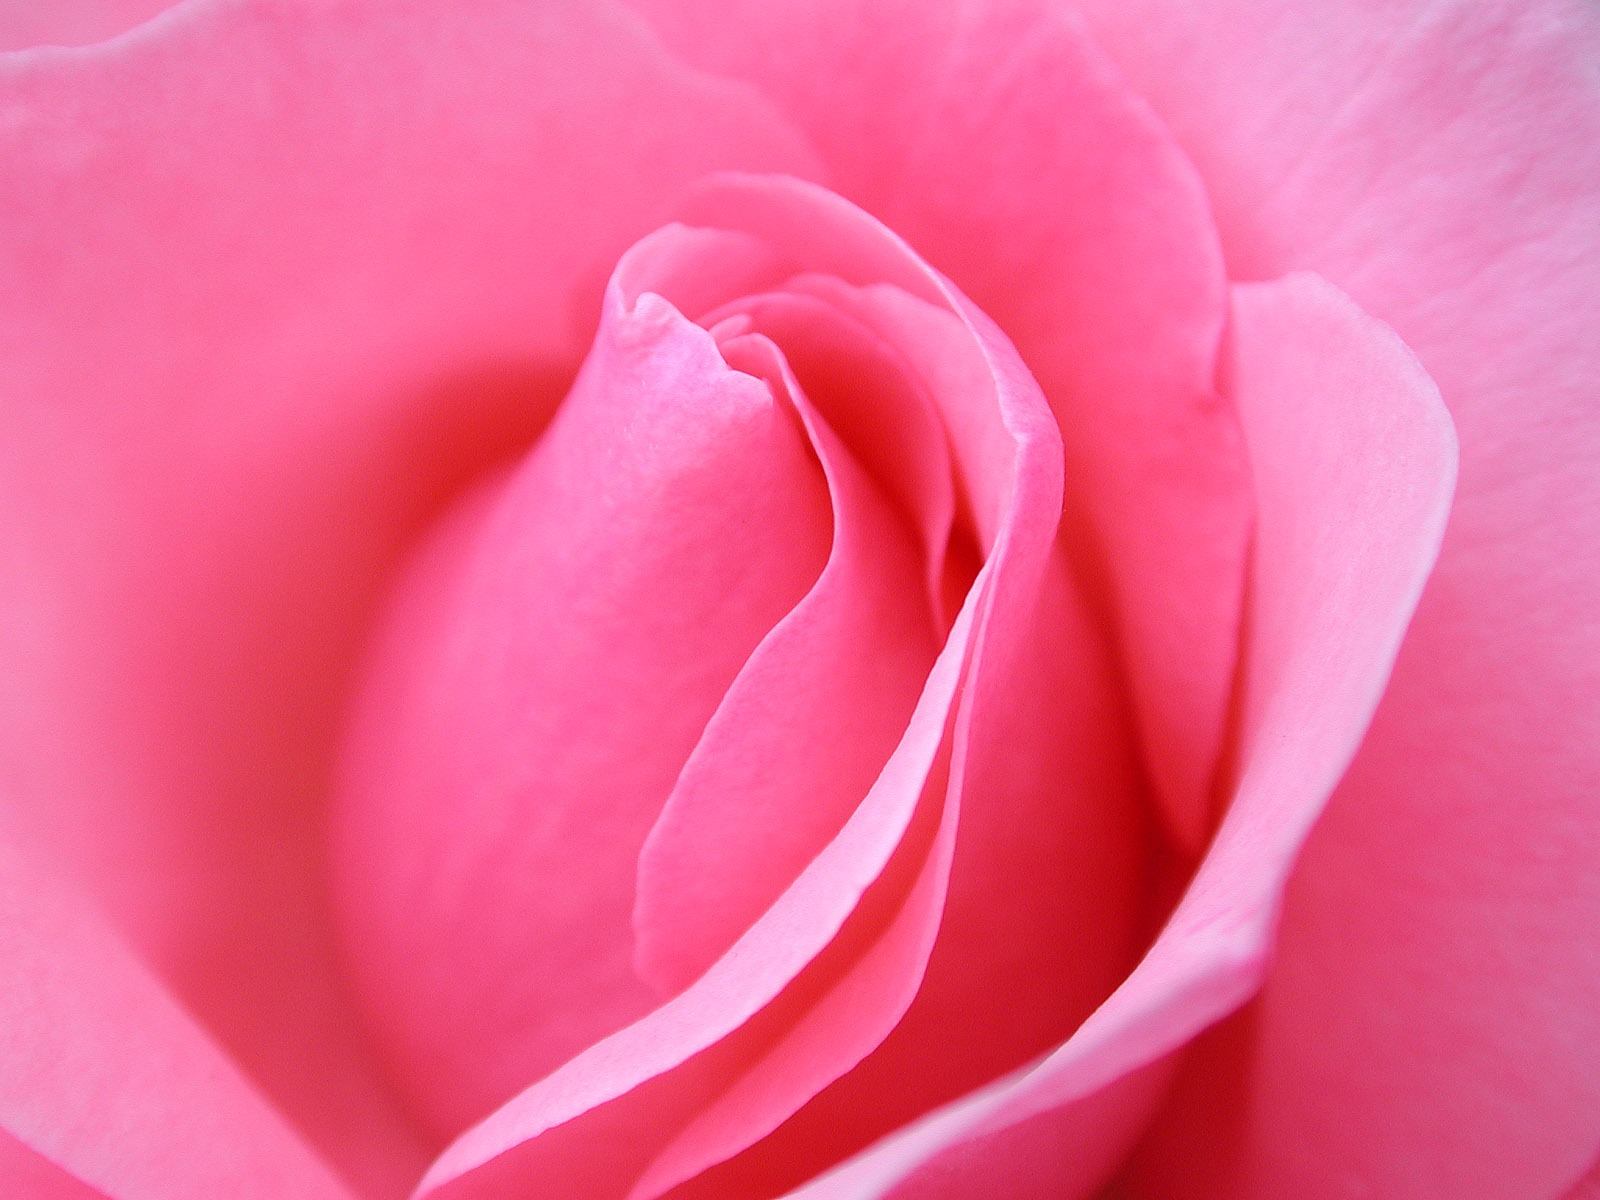 Beautiful Rose Flower Wallpaper Online Beautiful Rose Flower 1600x1200